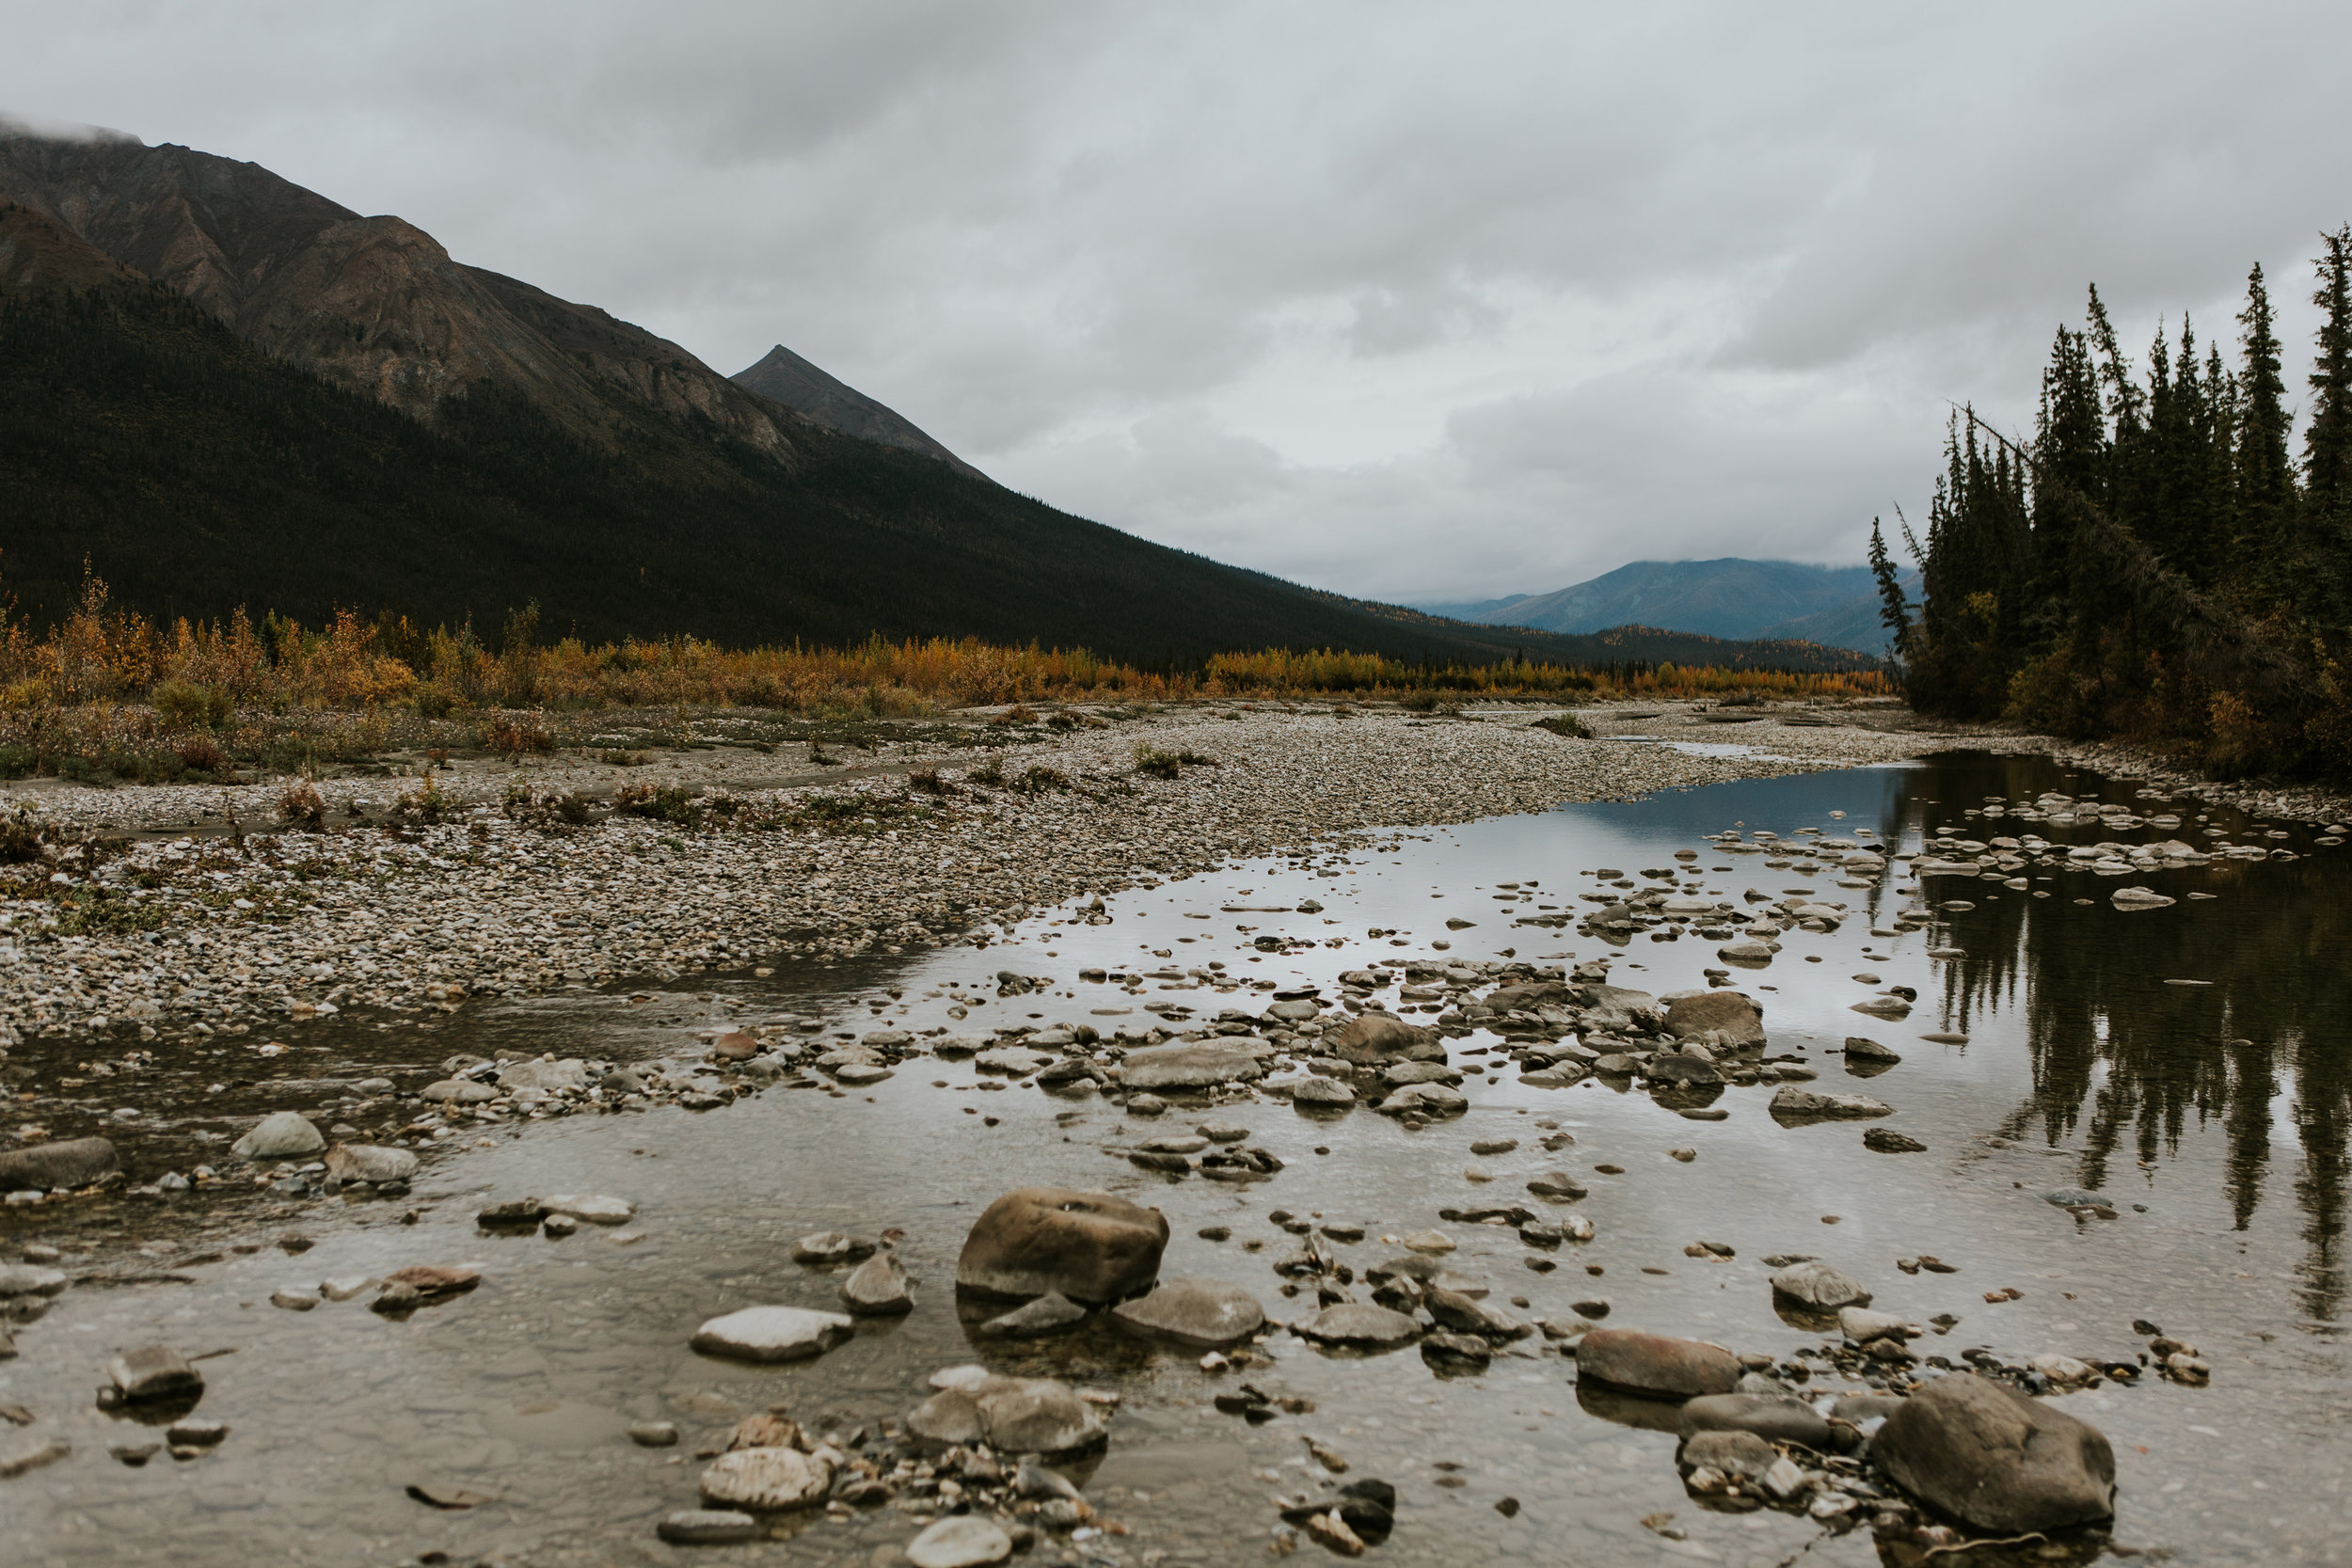 CindyGiovagnoli_Alaska_KoyukukRiver_SukakpakMountain_JimRiver_ArcticCircle_fly_fishing_September-017.jpg